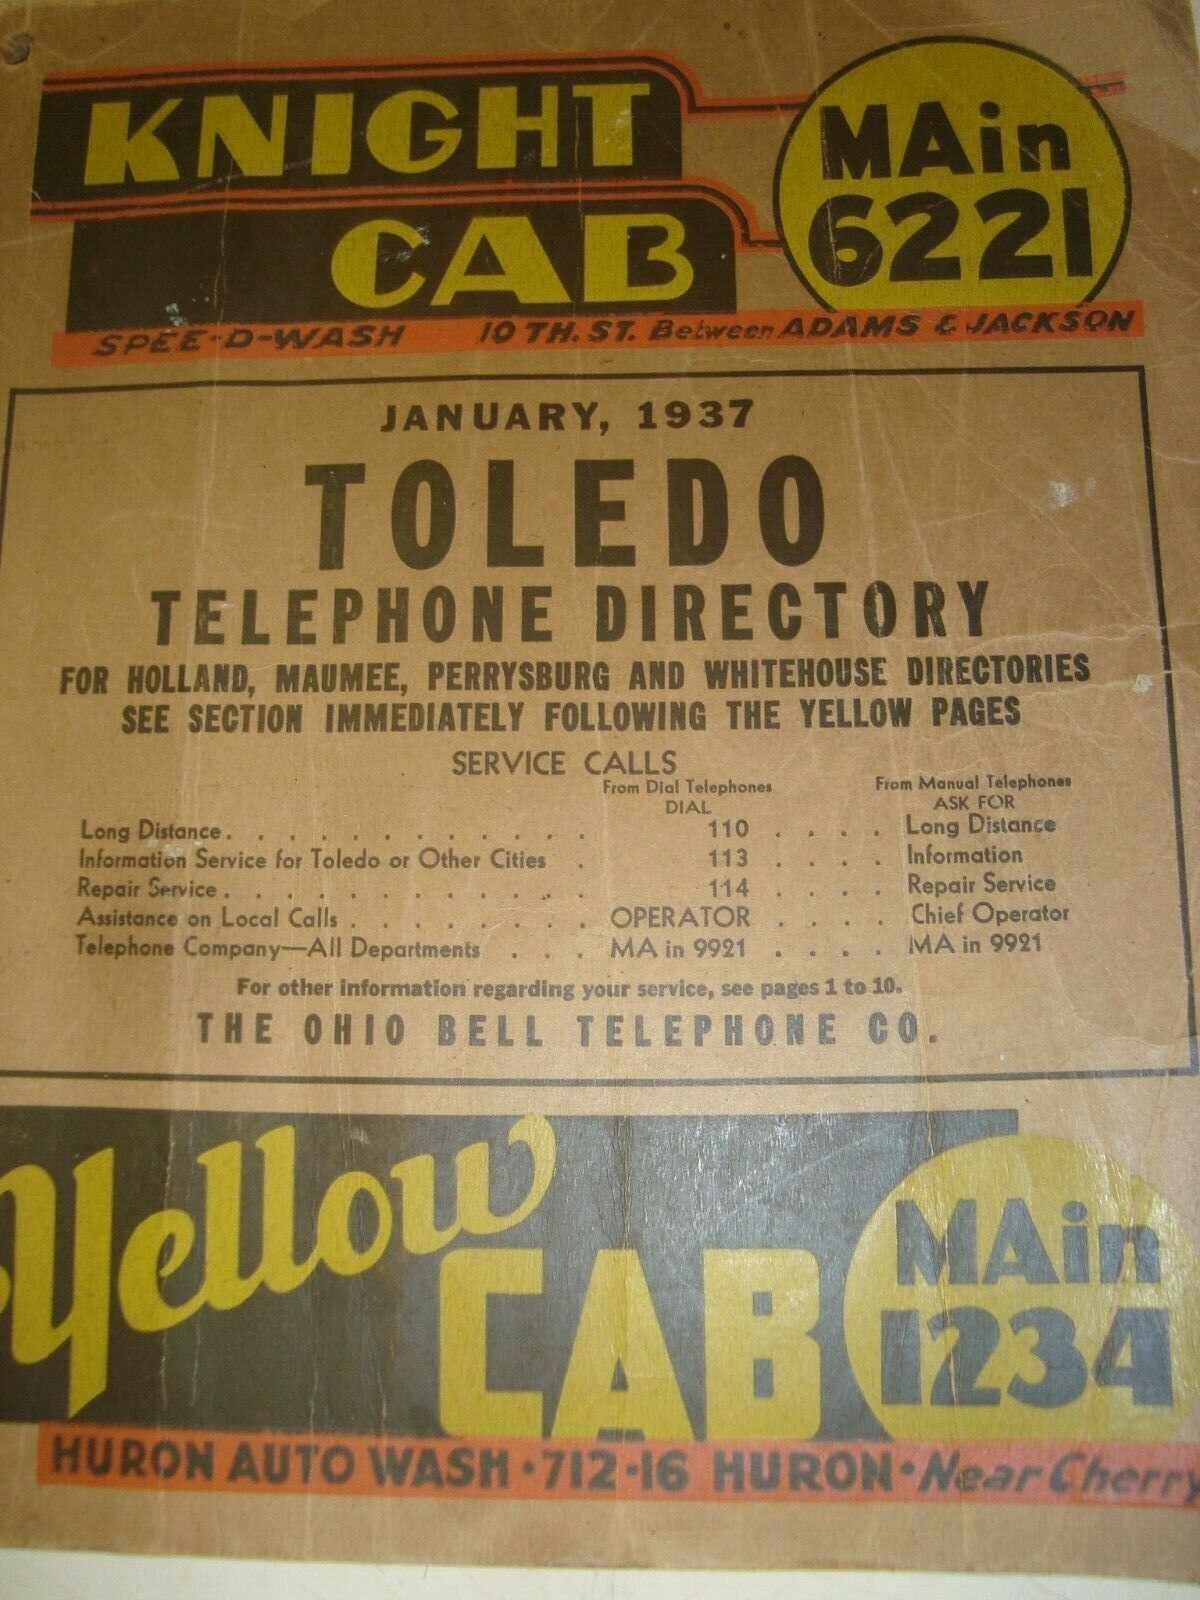 1937 TOLEDO OHIO BELL TELEPHONE DIRECTORY HOLLAND MAUMEE PERRYSBURG WHITEHOUSE  - $35.00